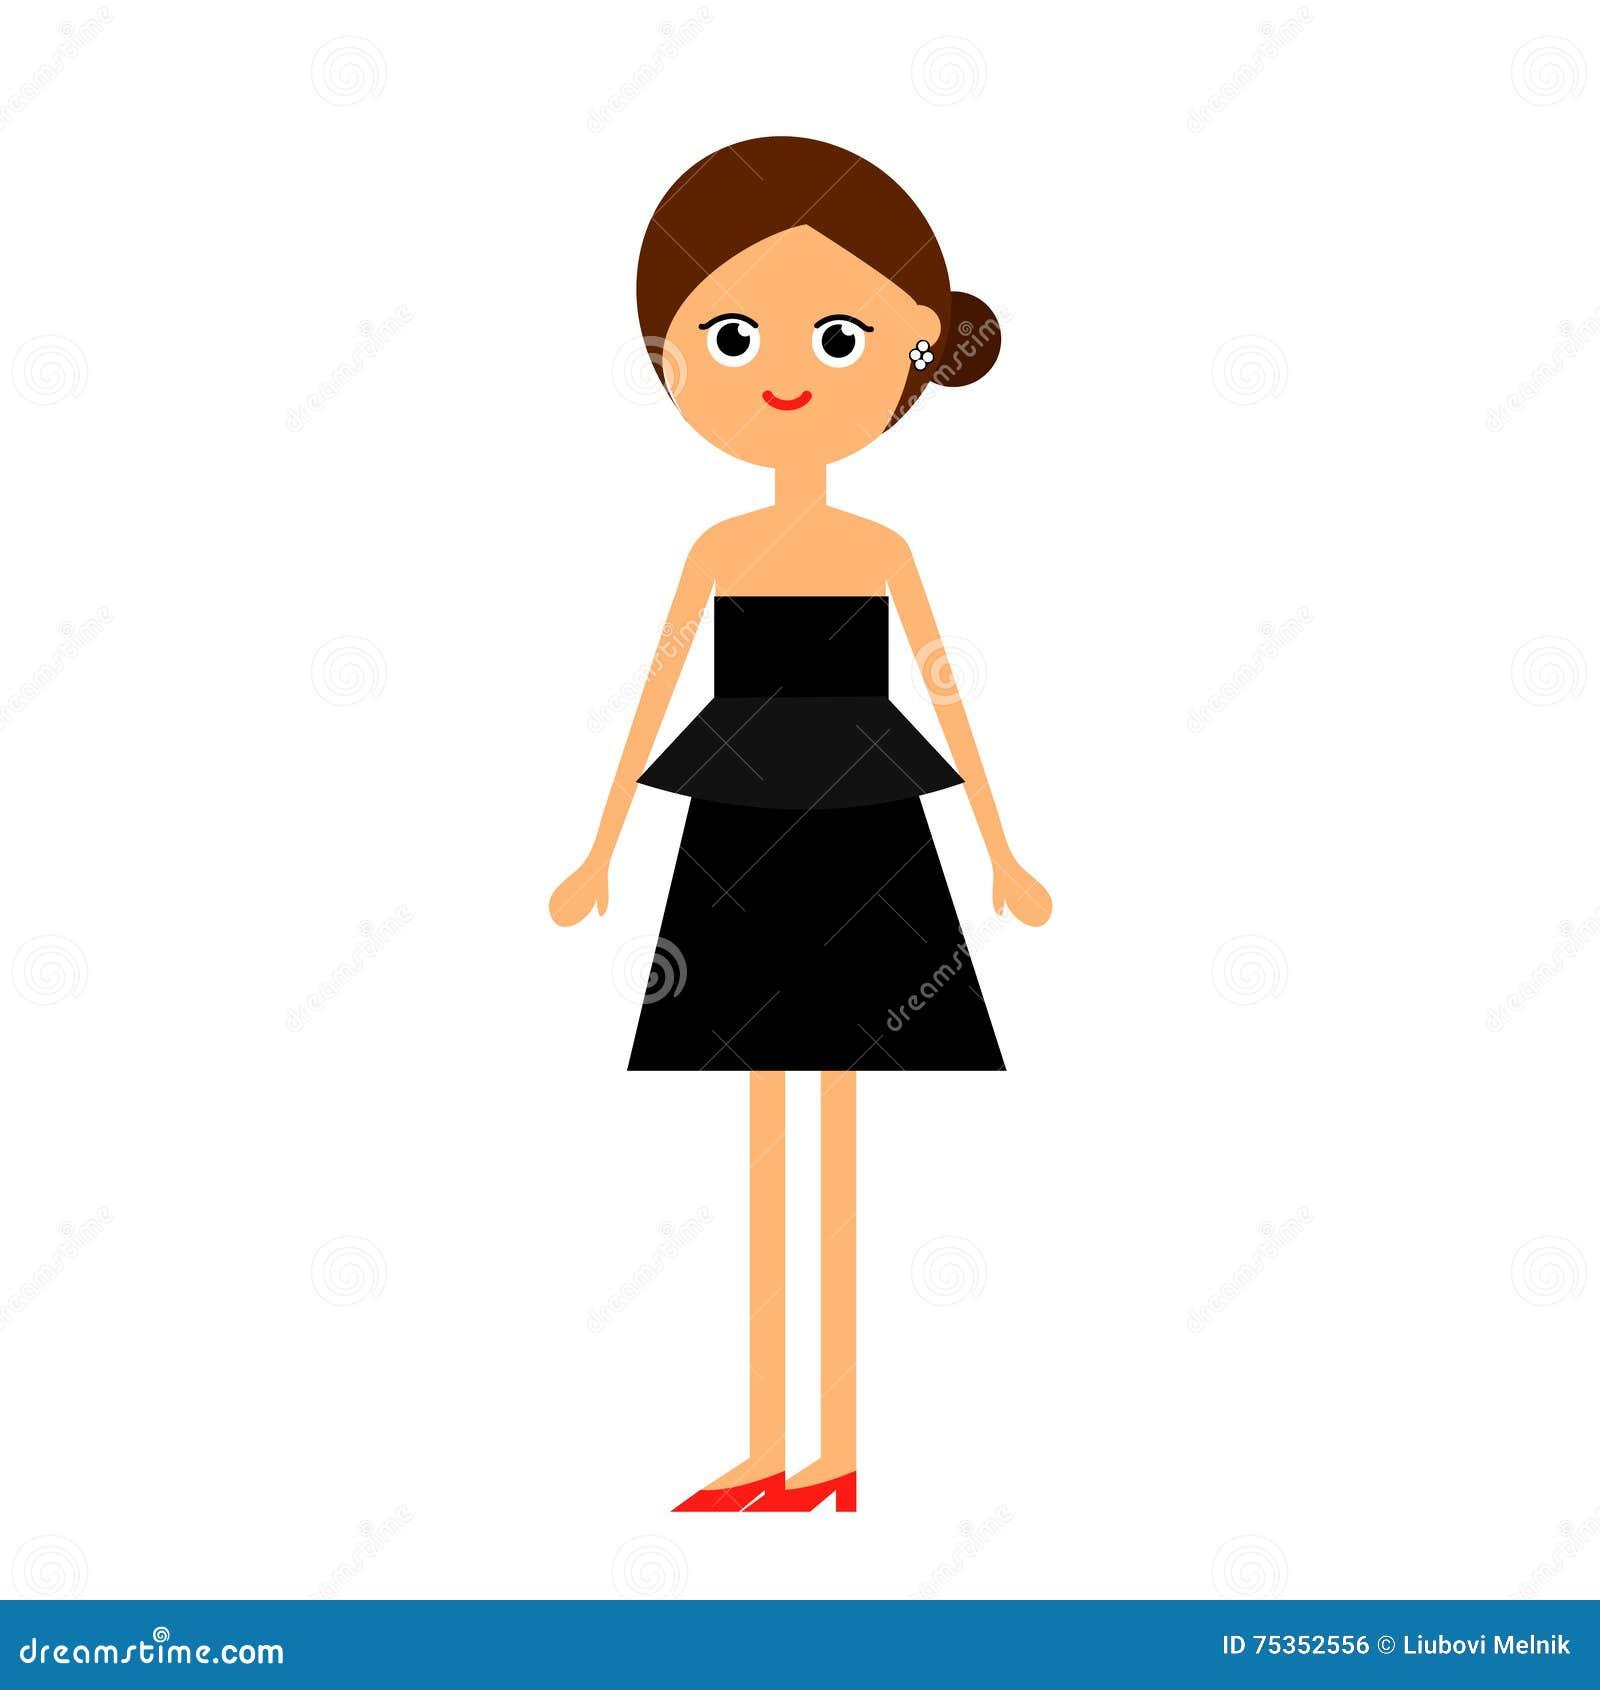 Black dress girl image clip